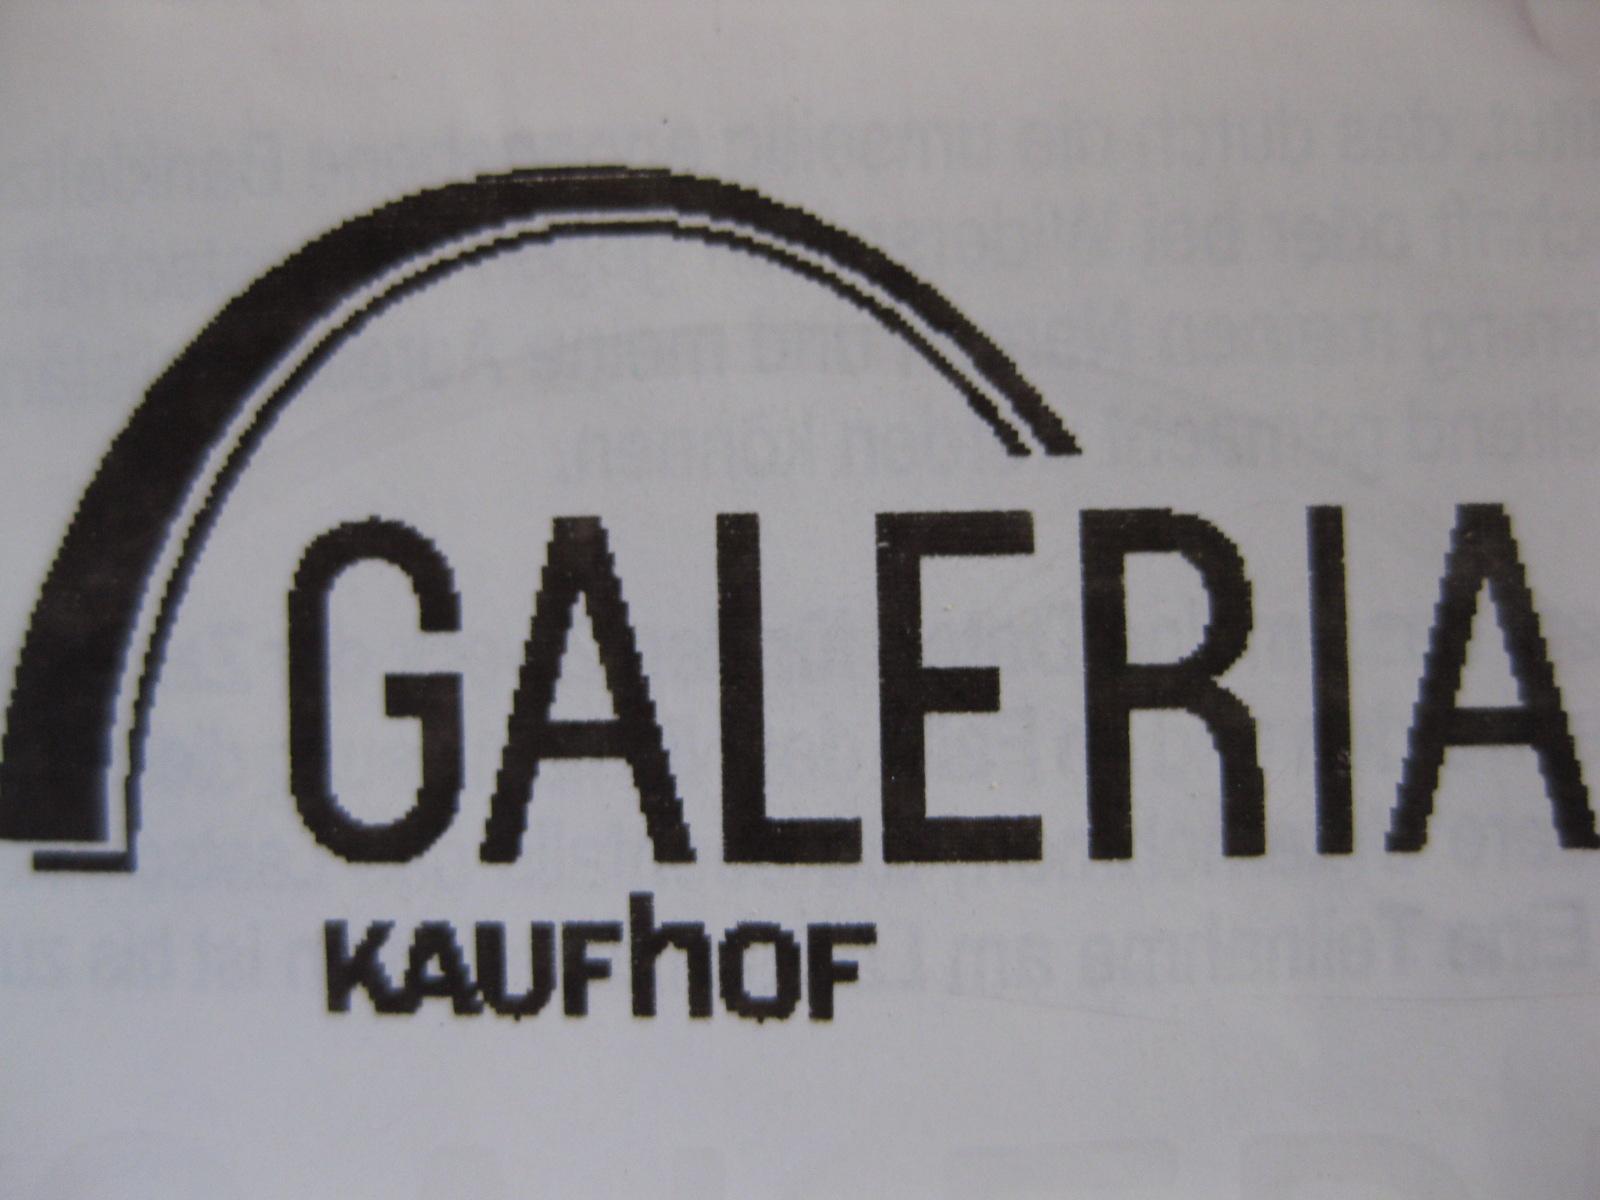 Galeria Kaufhof Am Marienplatz 80331 München Altstadt